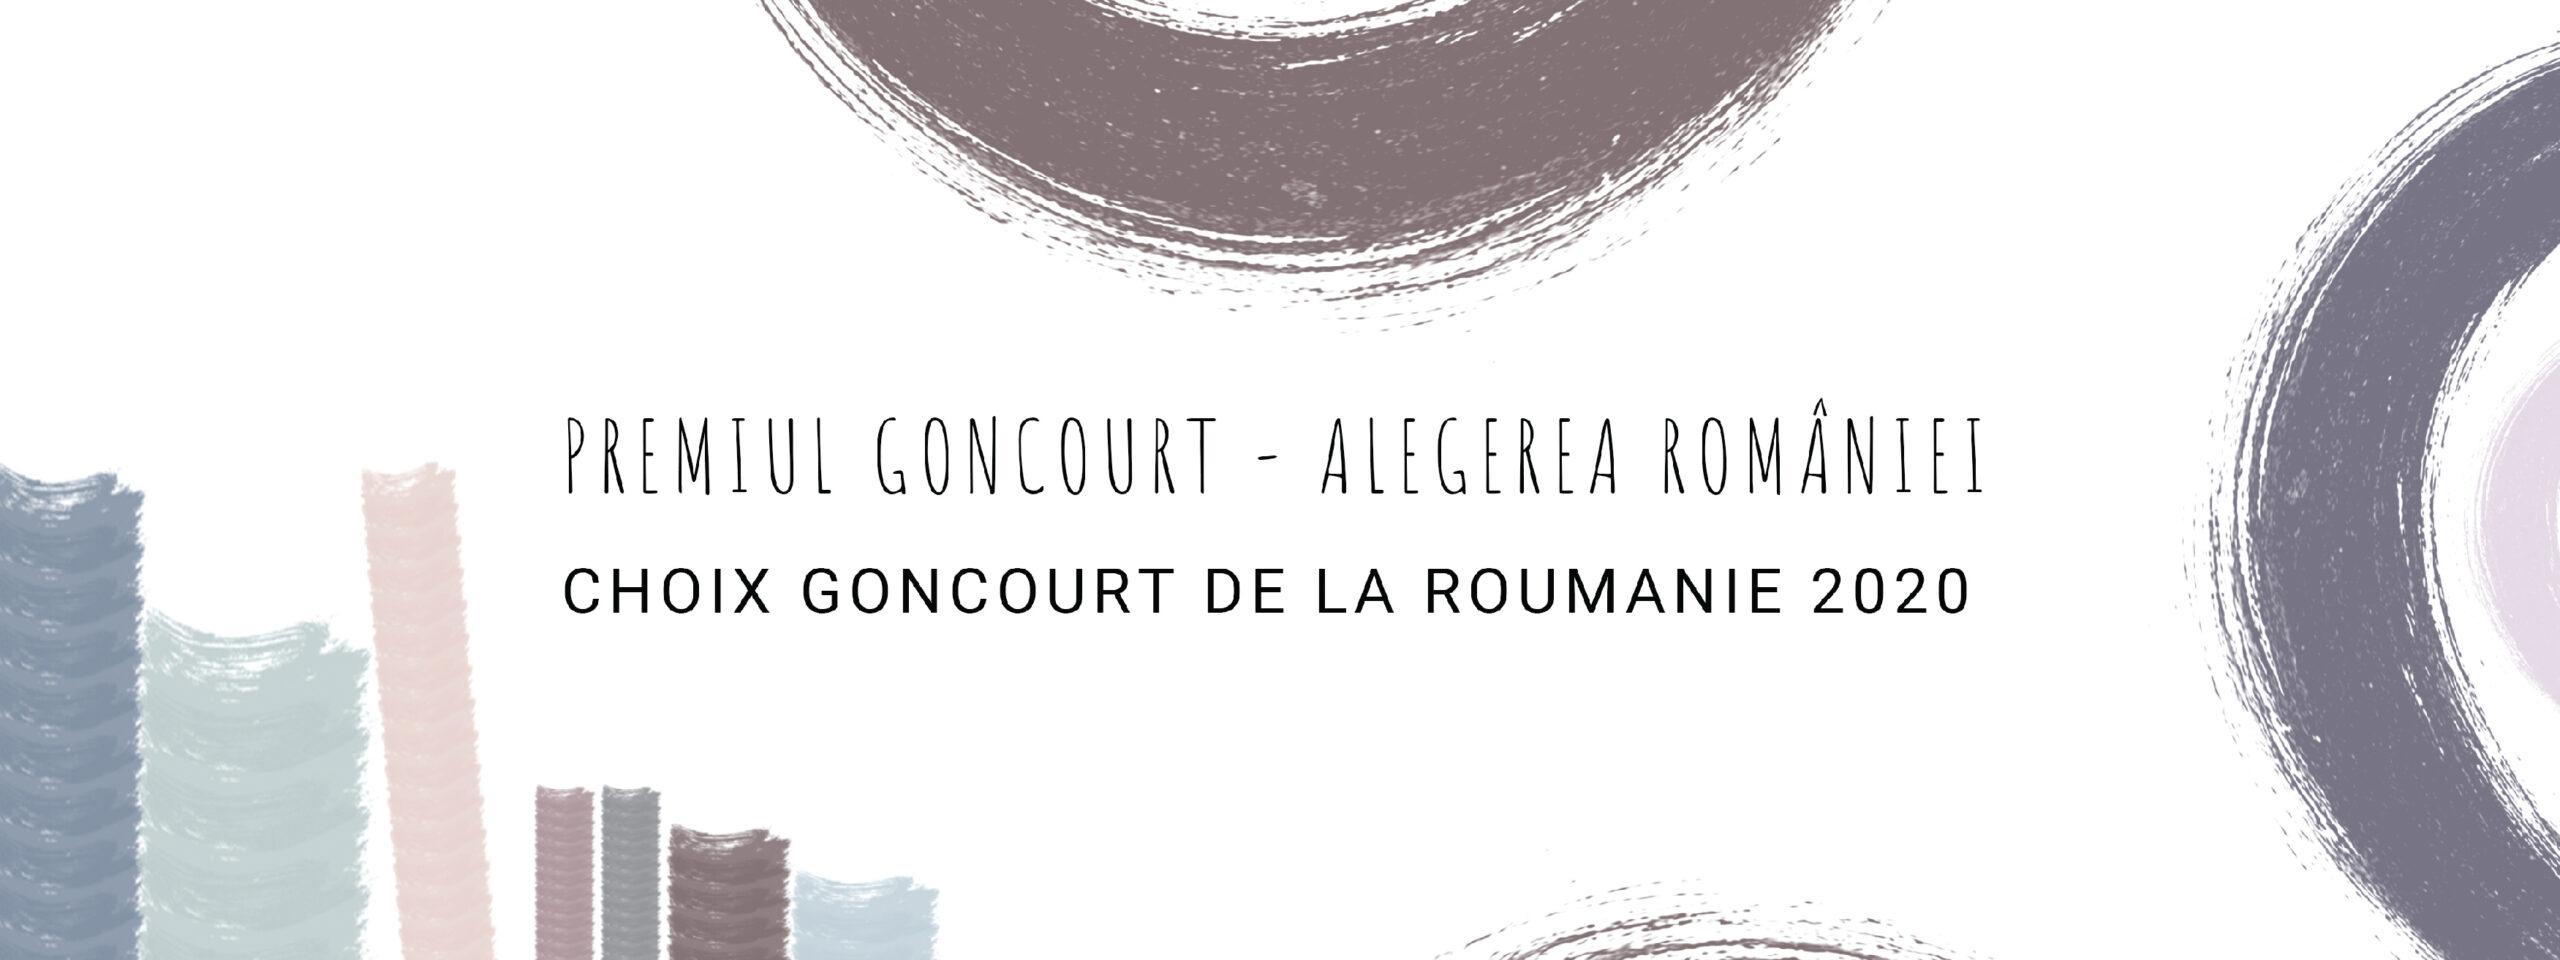 Premiul Goncourt- Alegerea României 2020